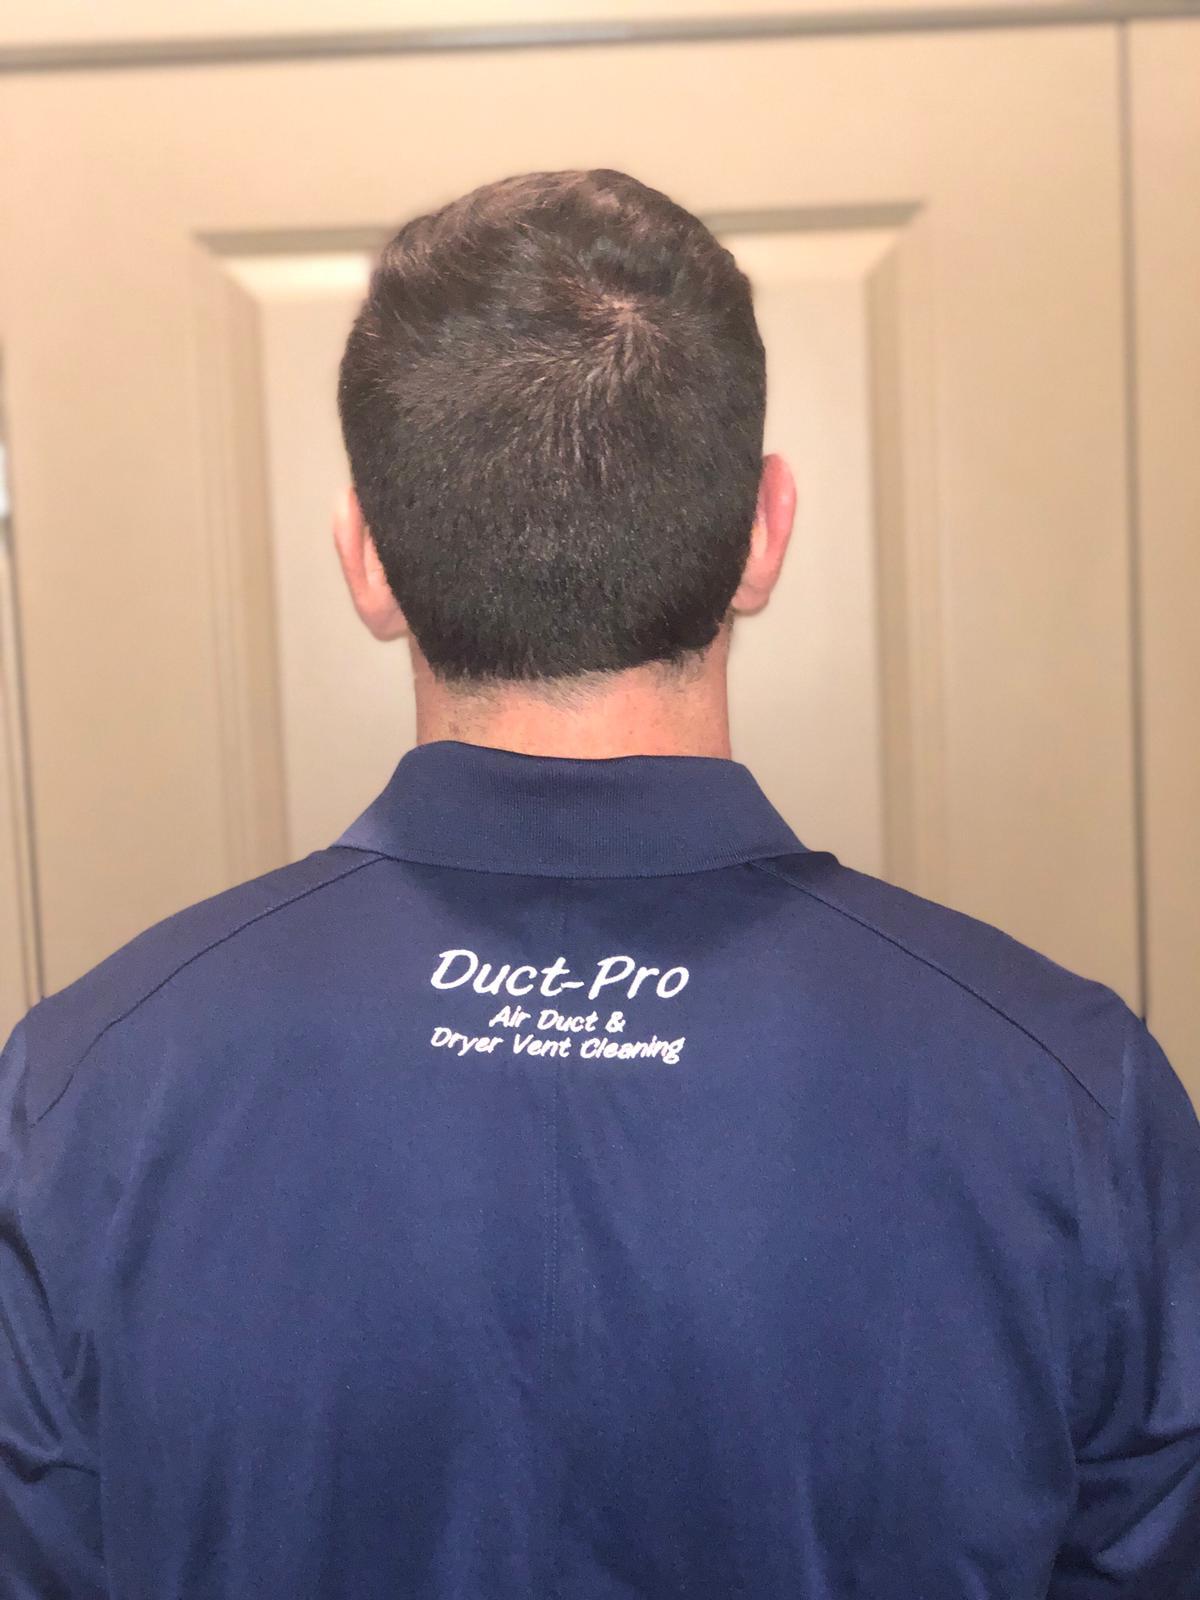 Duct-Pro